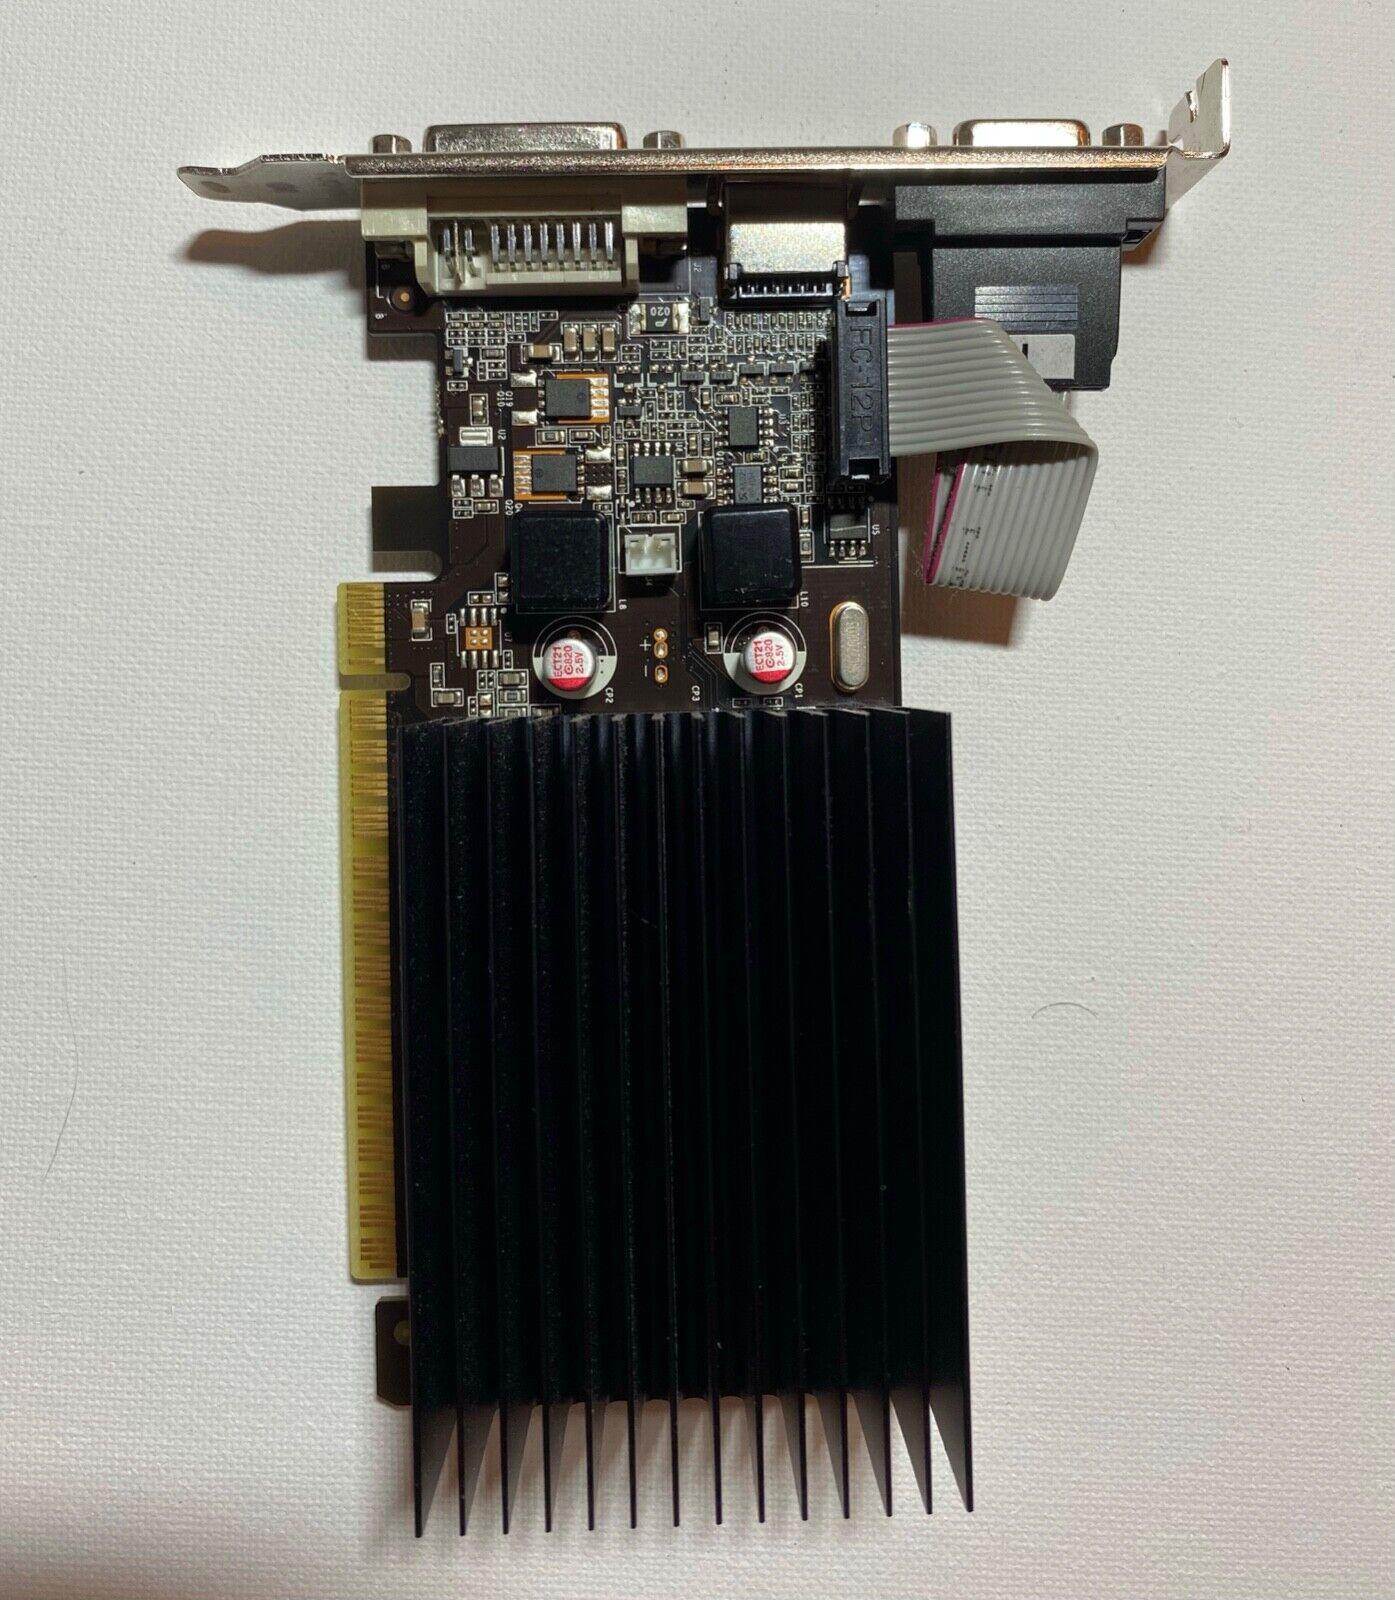 Palit GeForce 210 gf210 1gb ddr3 PCI-E DVI HDMI Grafikkarte